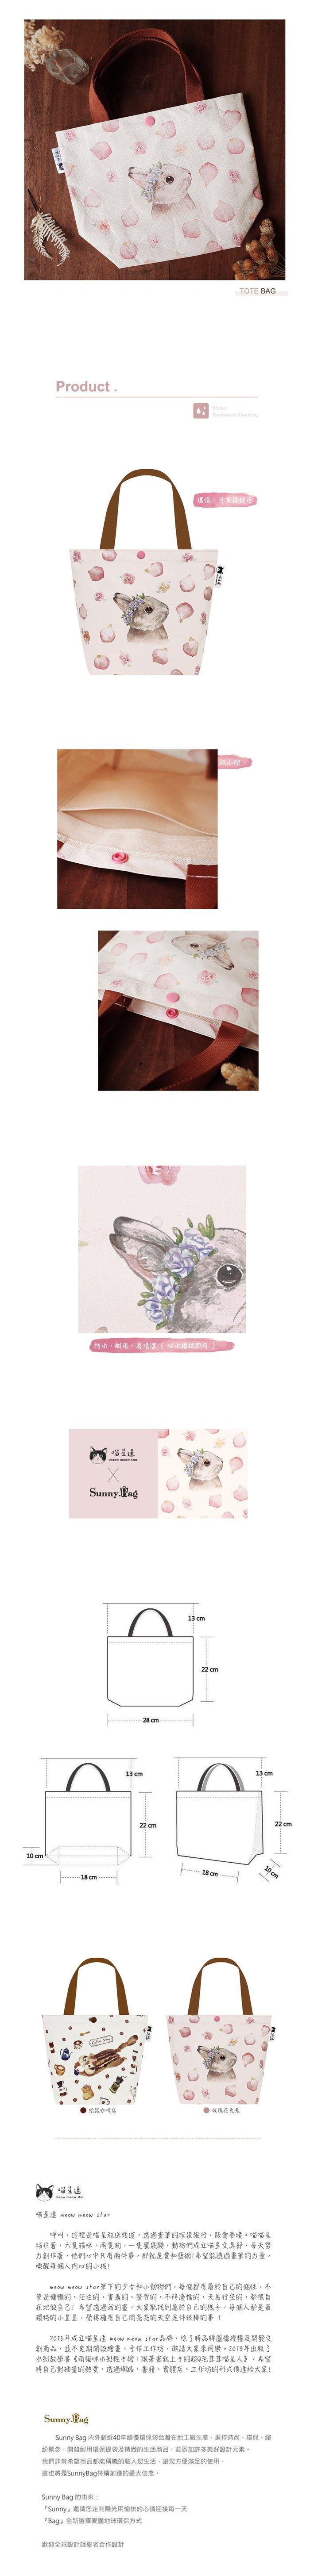 (複製)Sunny Bag|喵星達-貓的色彩肩背包